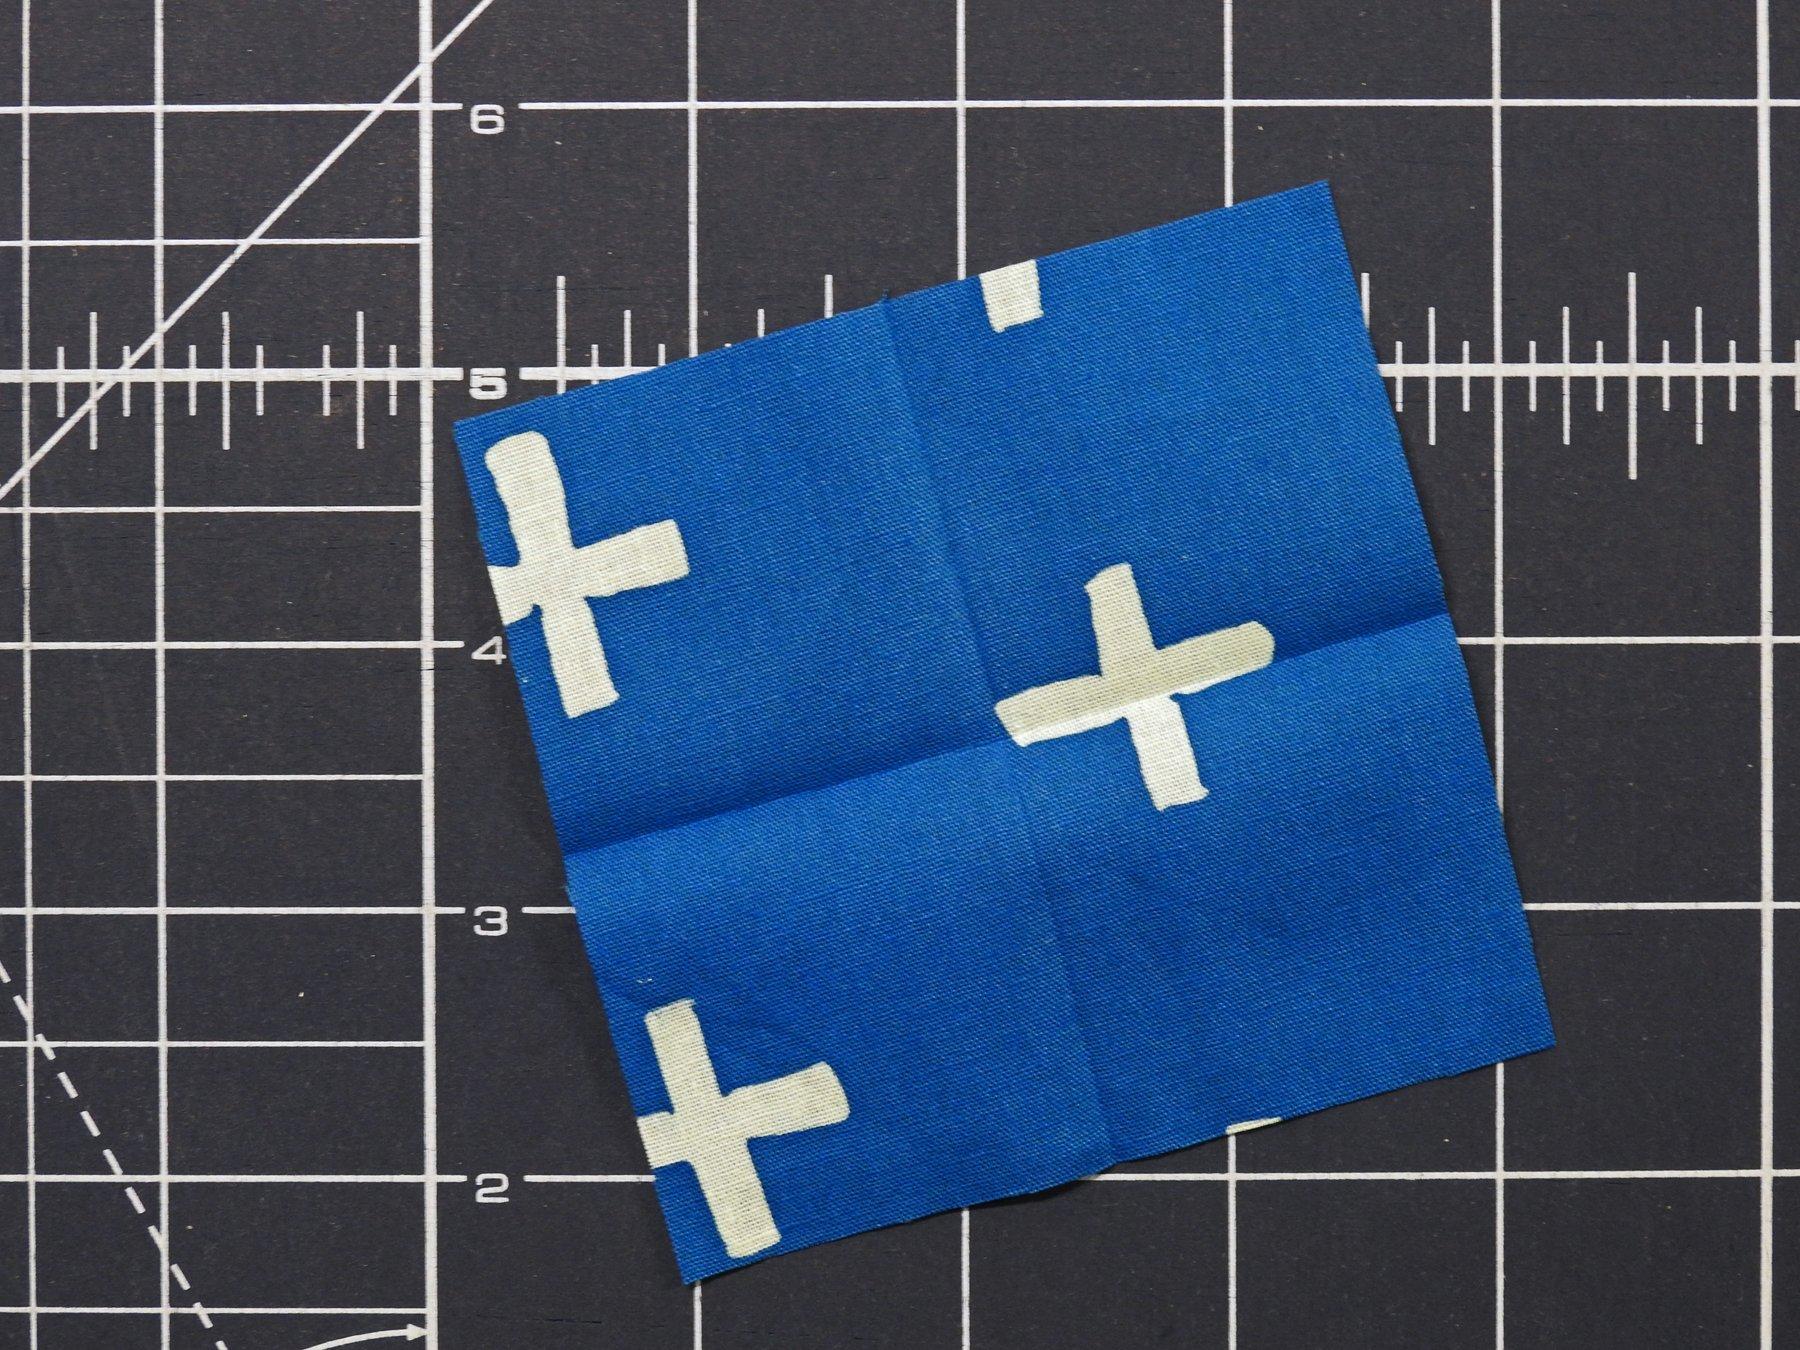 Fold Center Square in Half